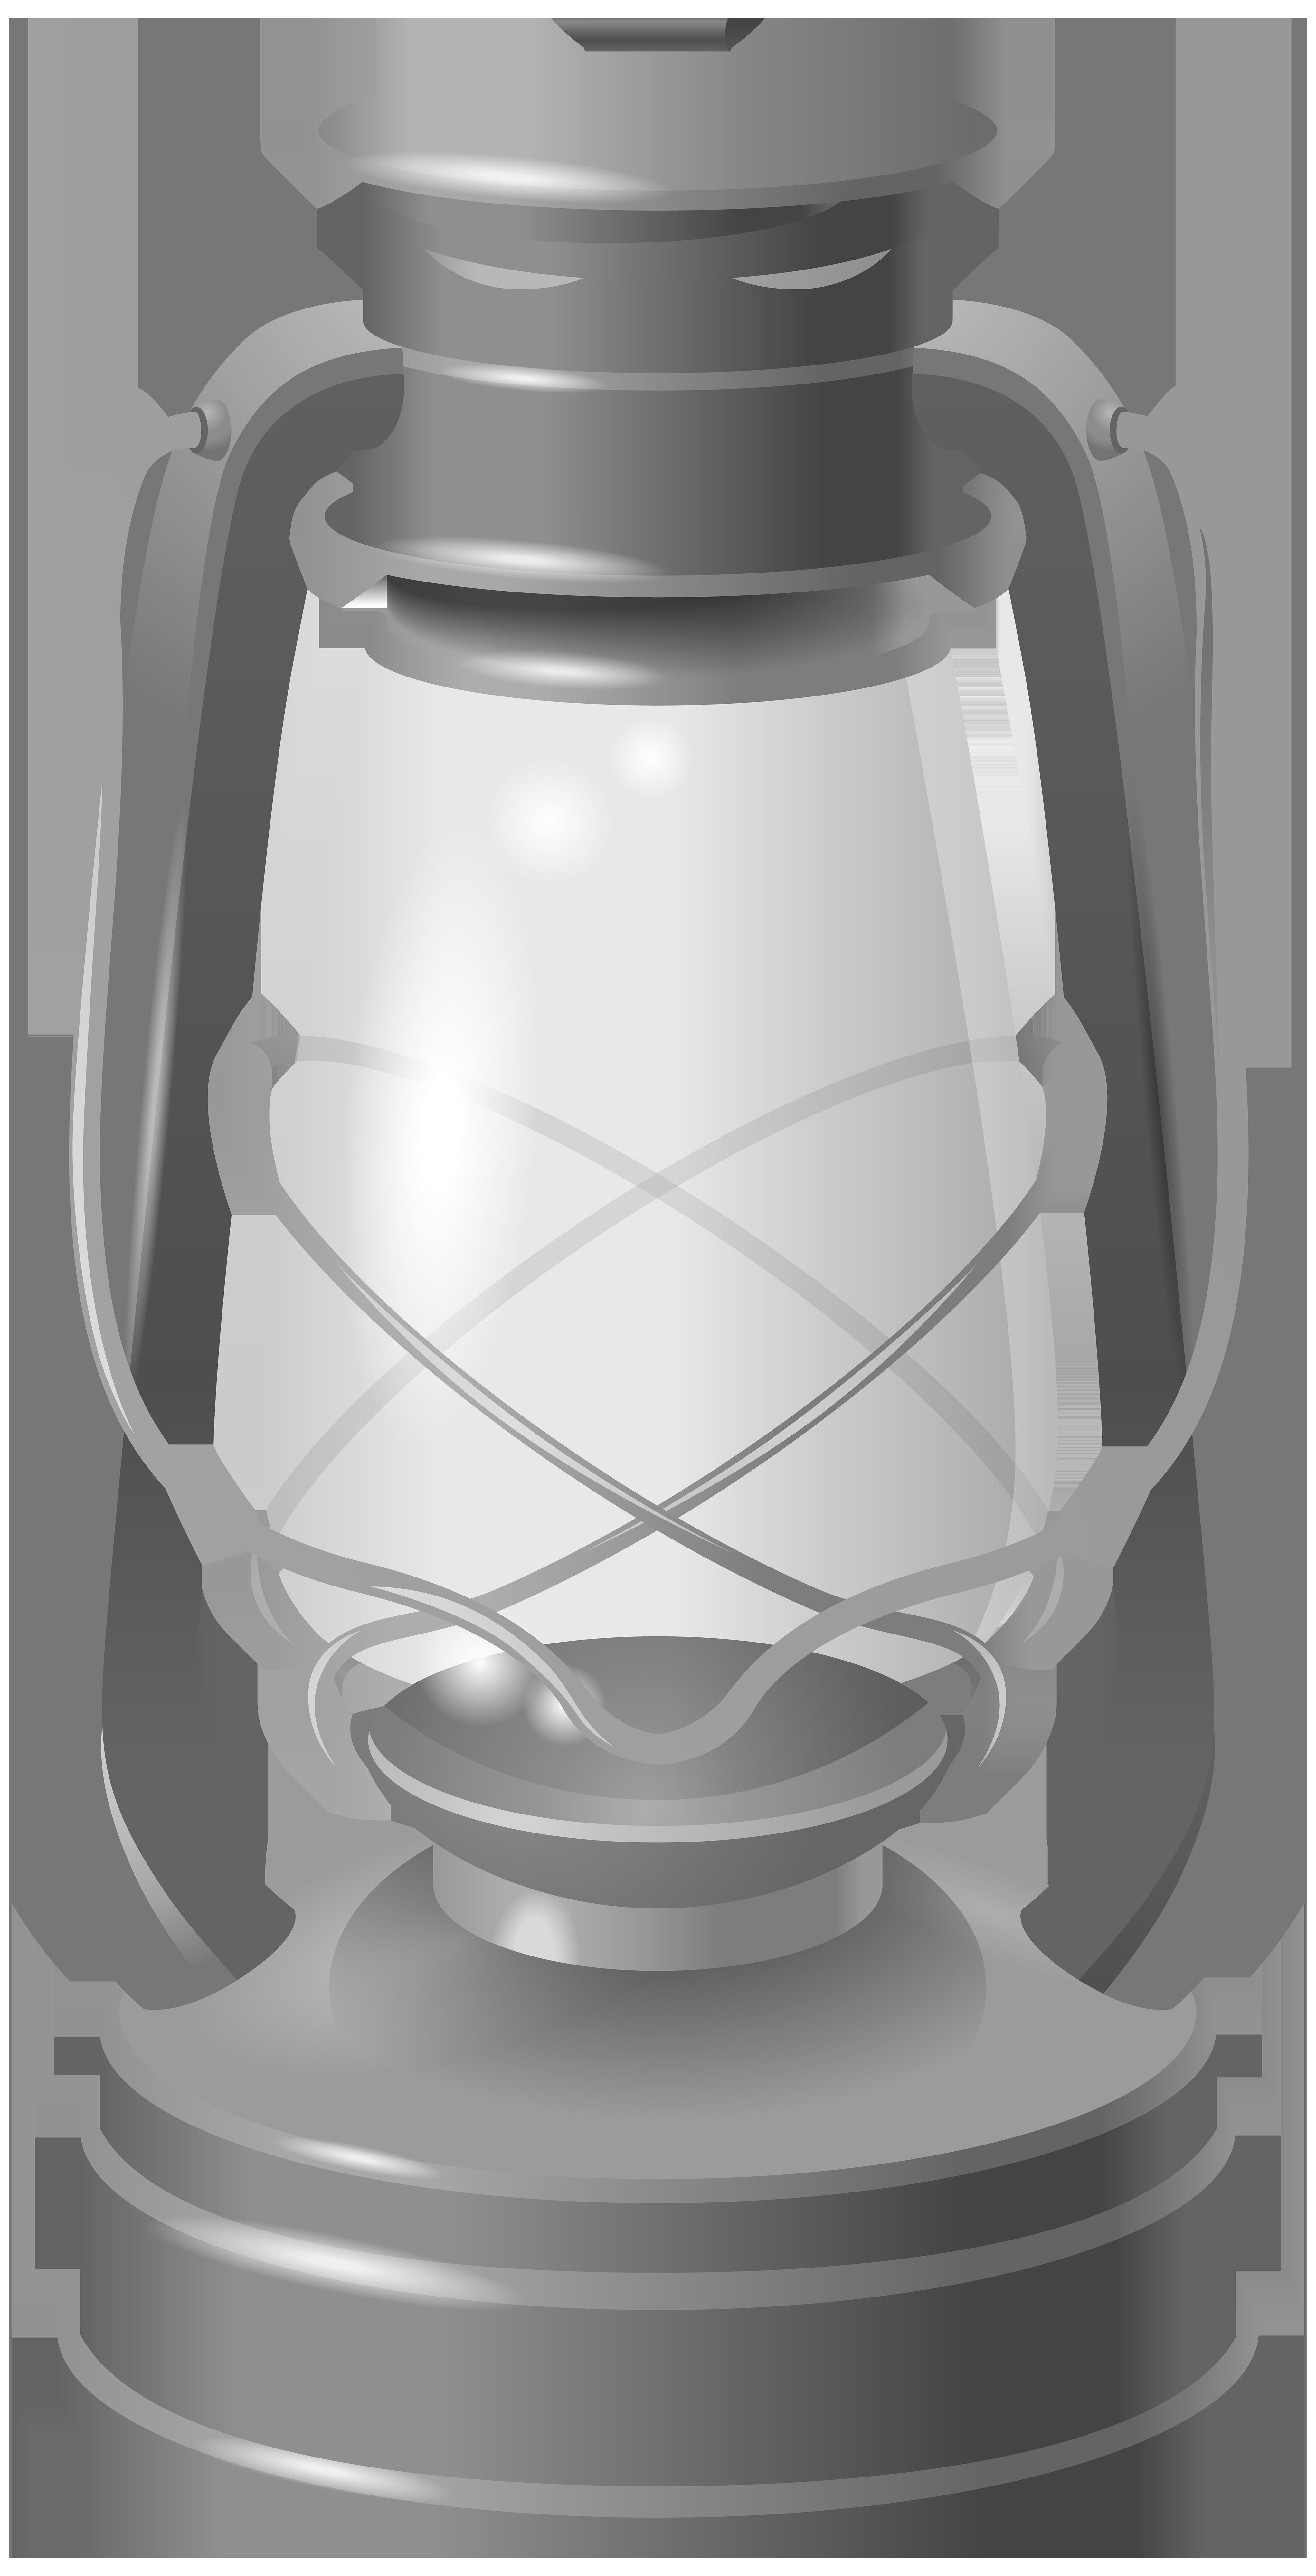 Clip art png image. Lamp clipart camping lantern